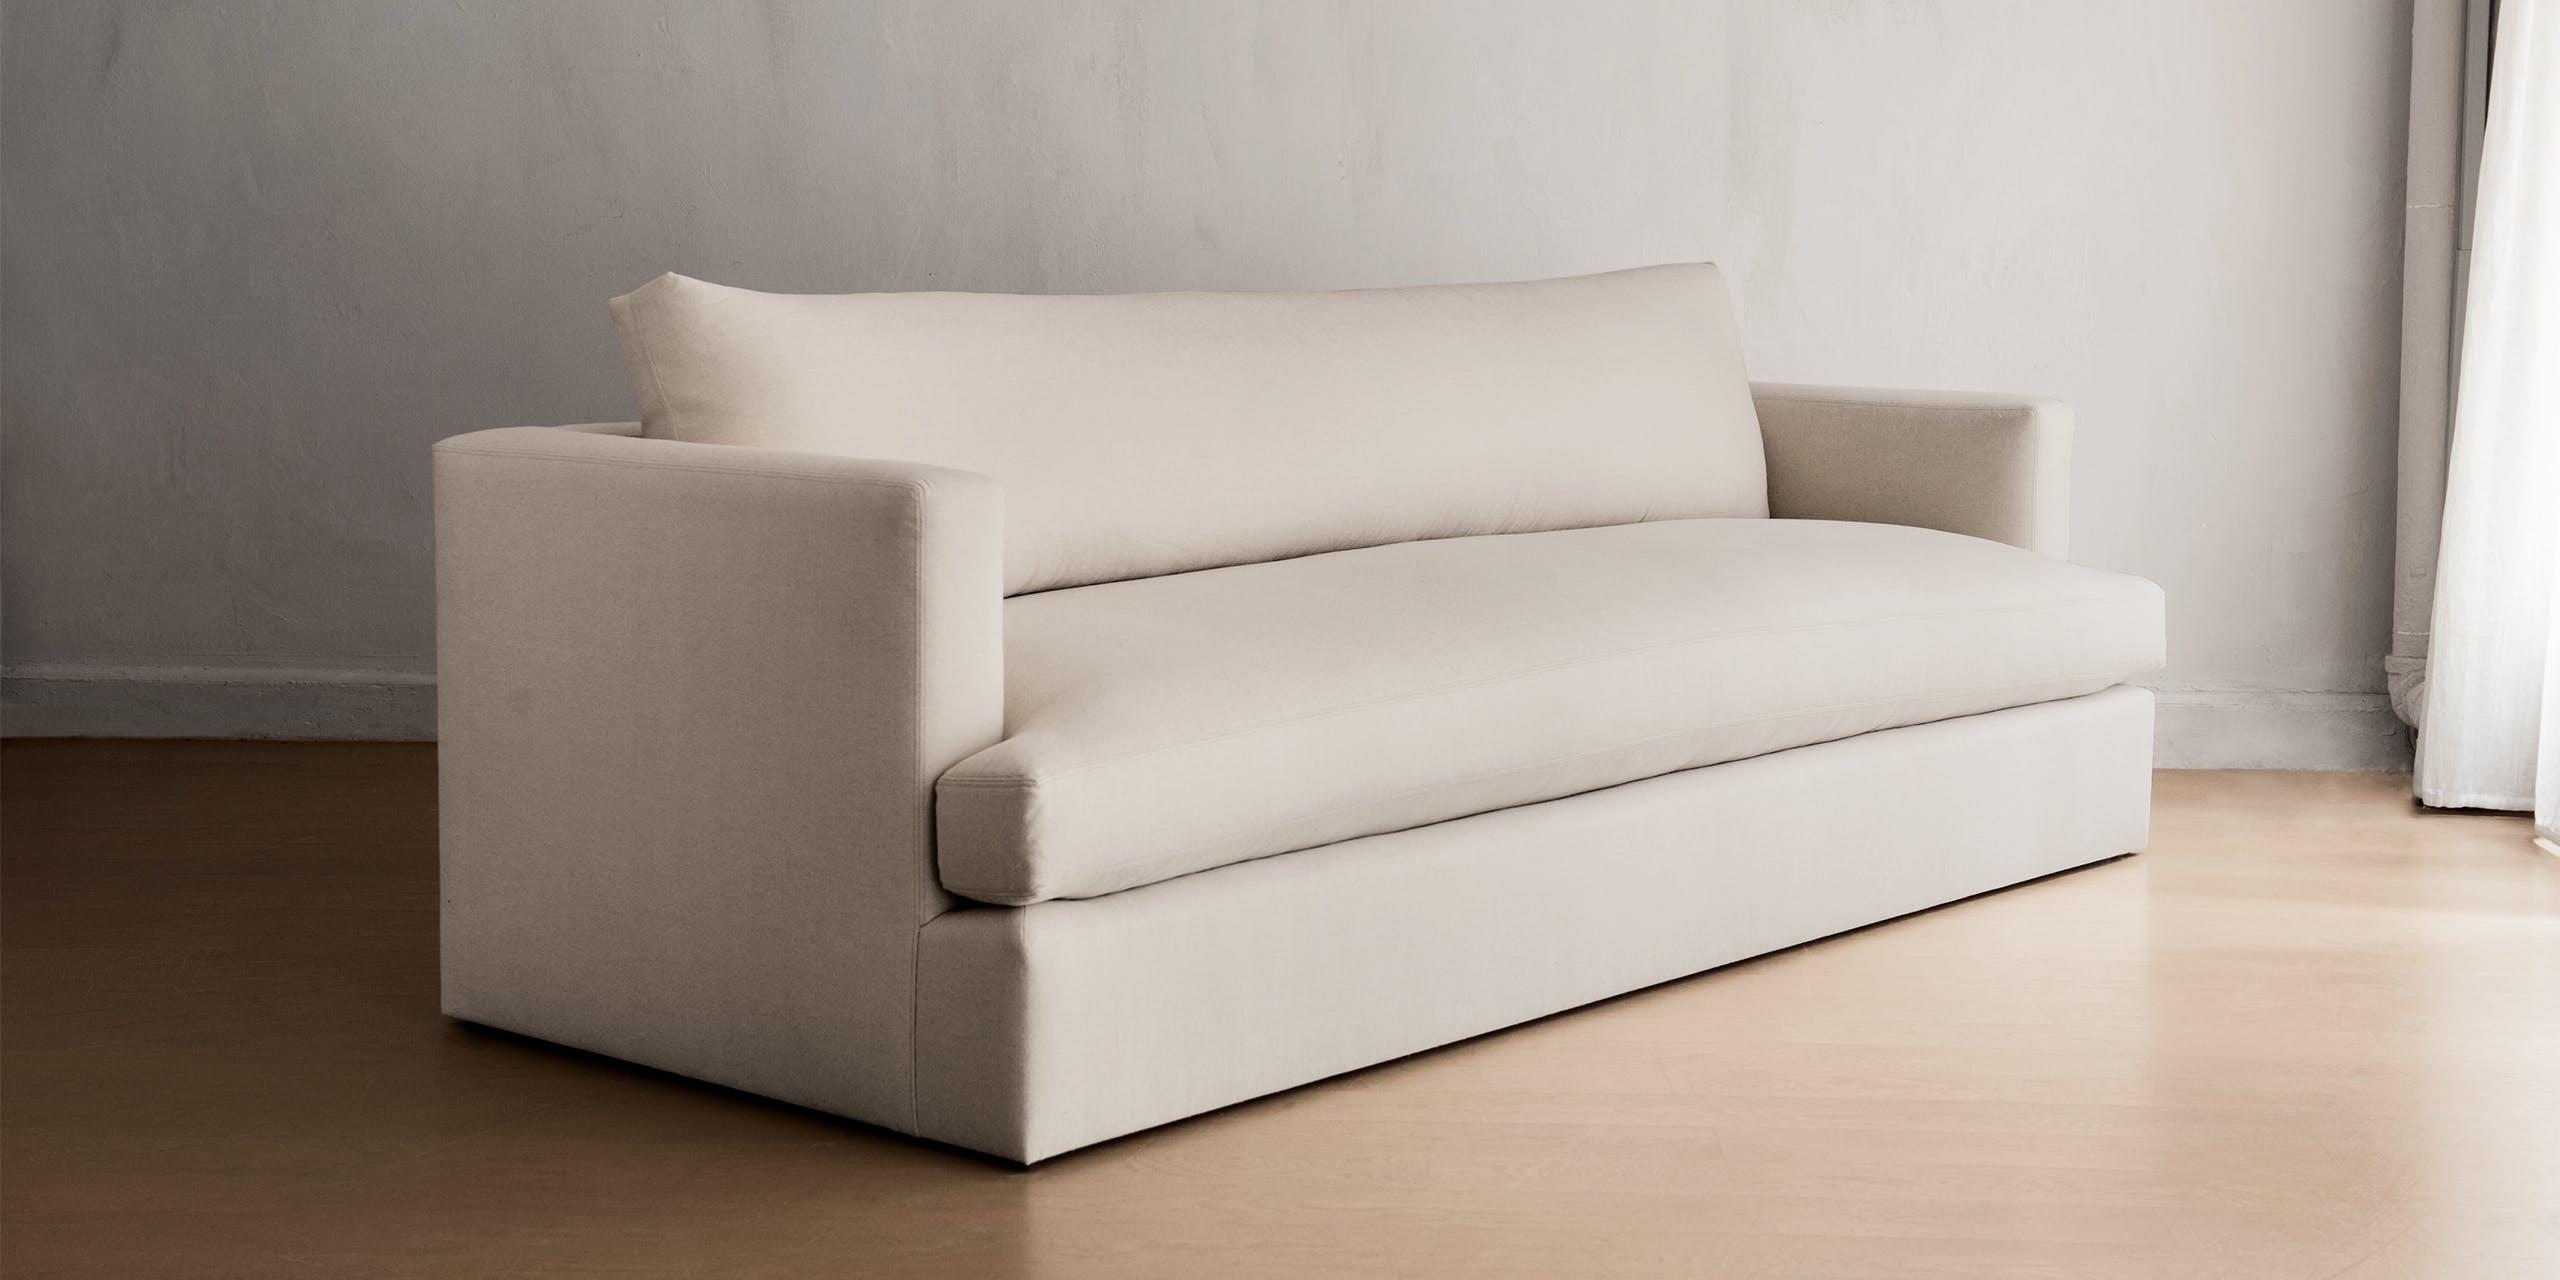 Chelsea square mono sofa main.jpg?ixlib=rails 2.1